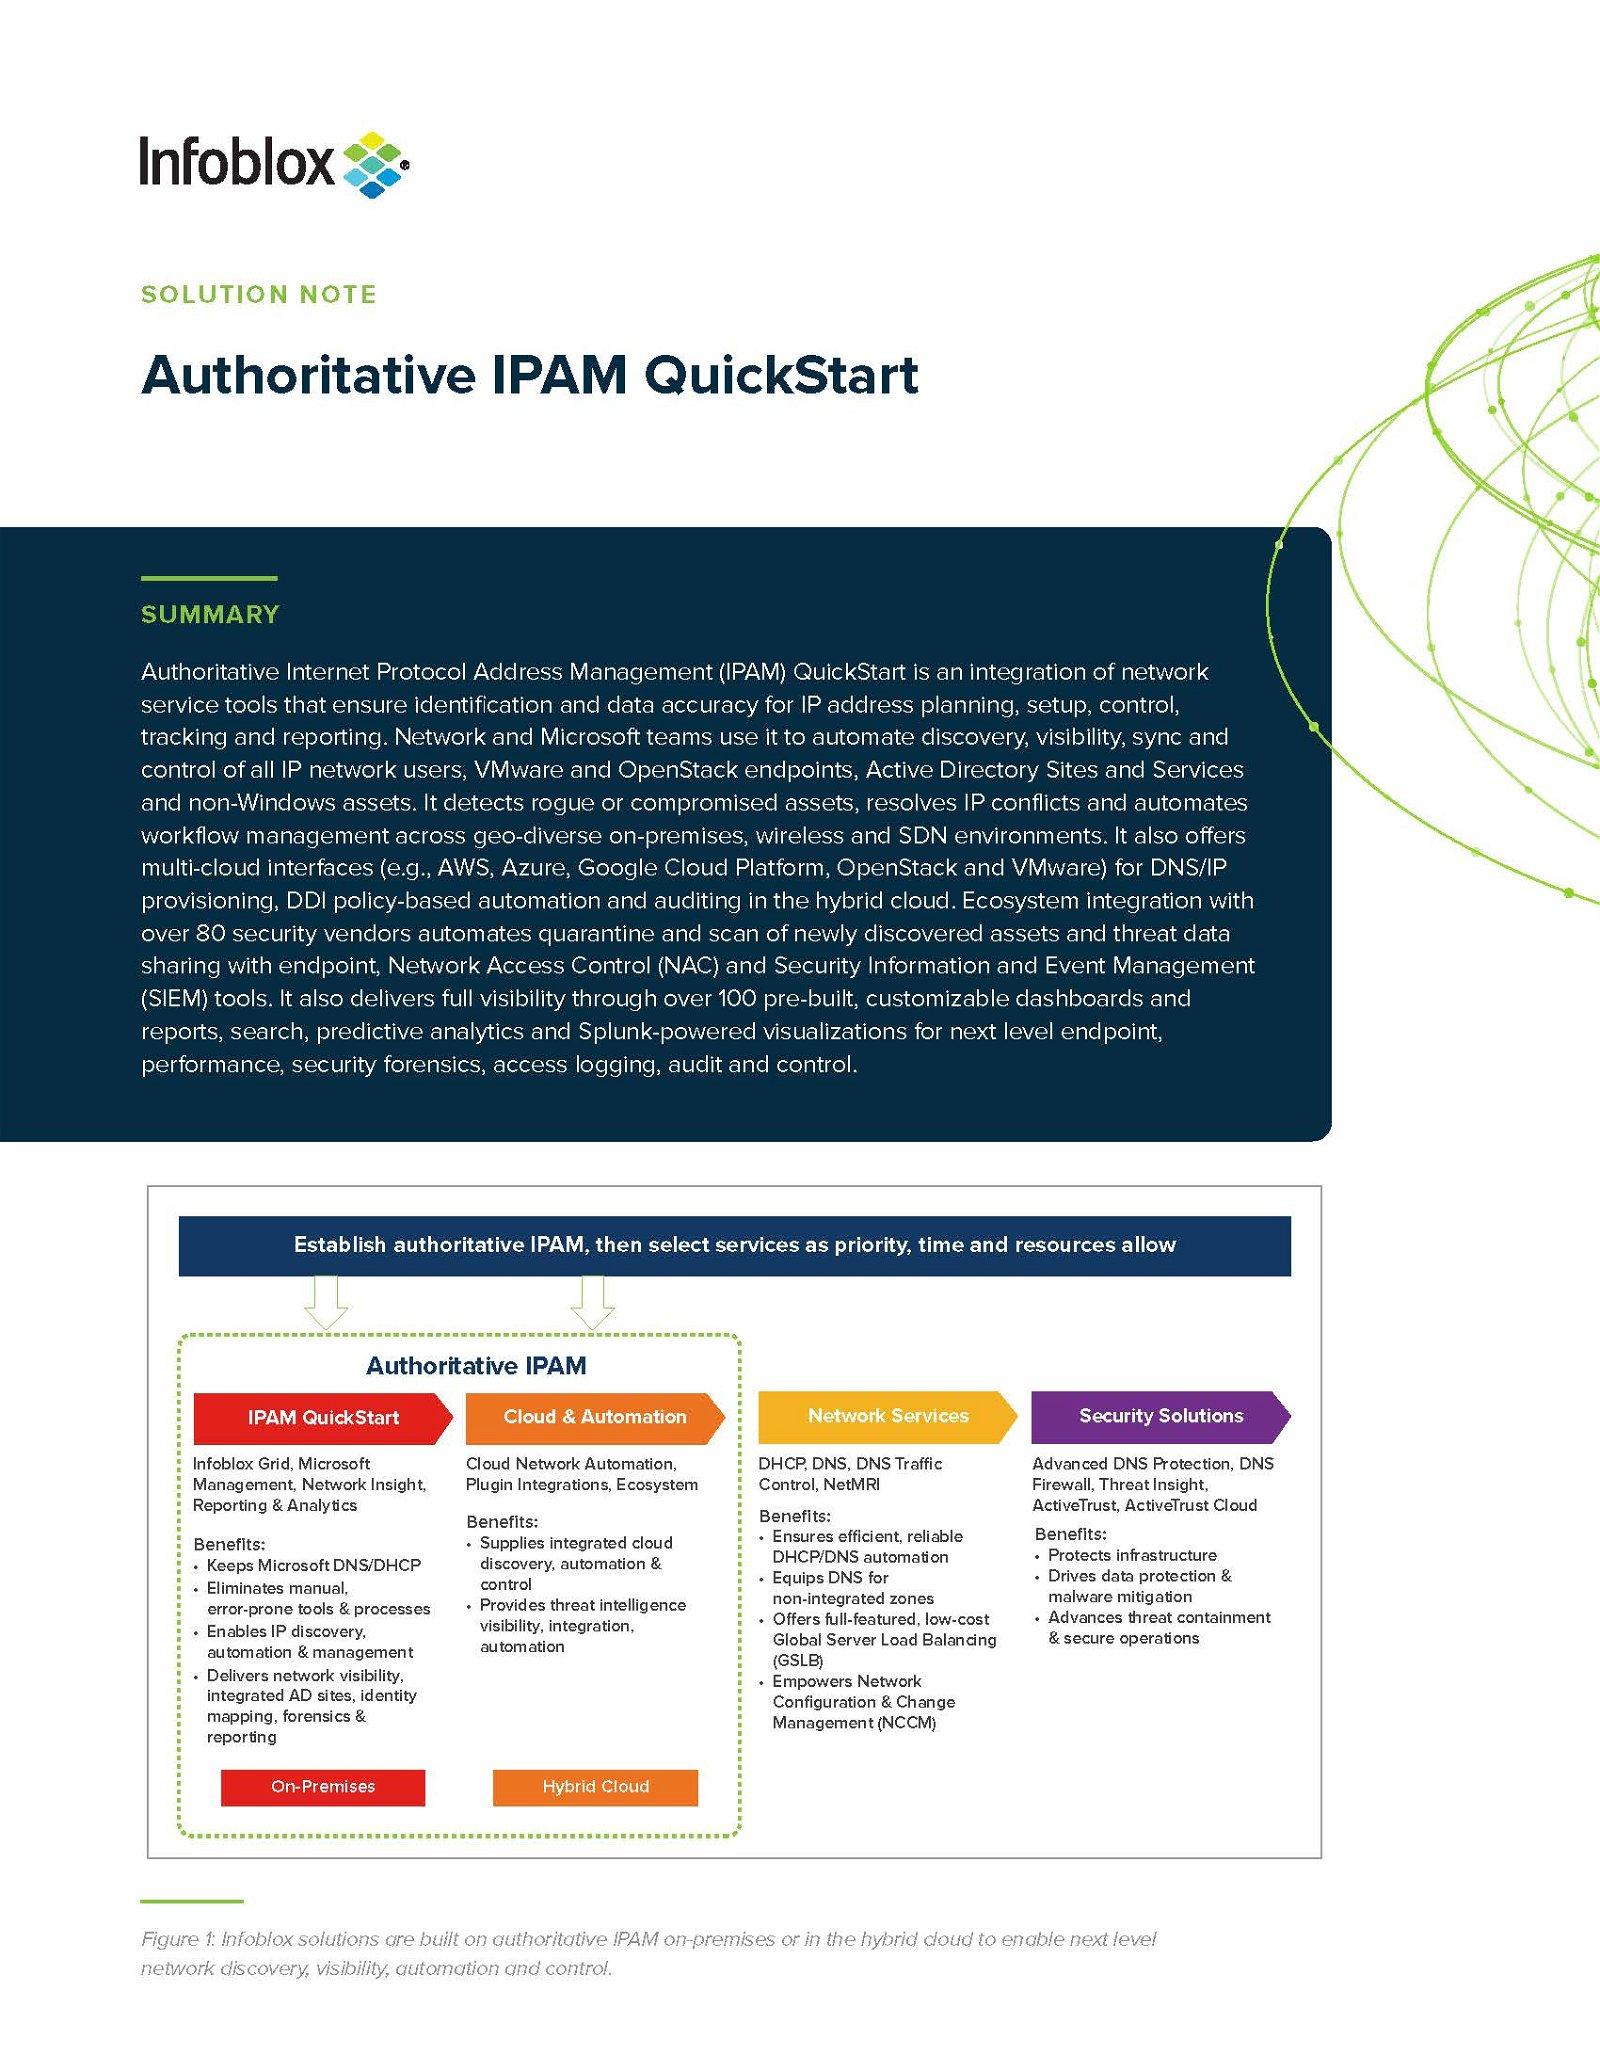 Authoritative IPAM QuickStart